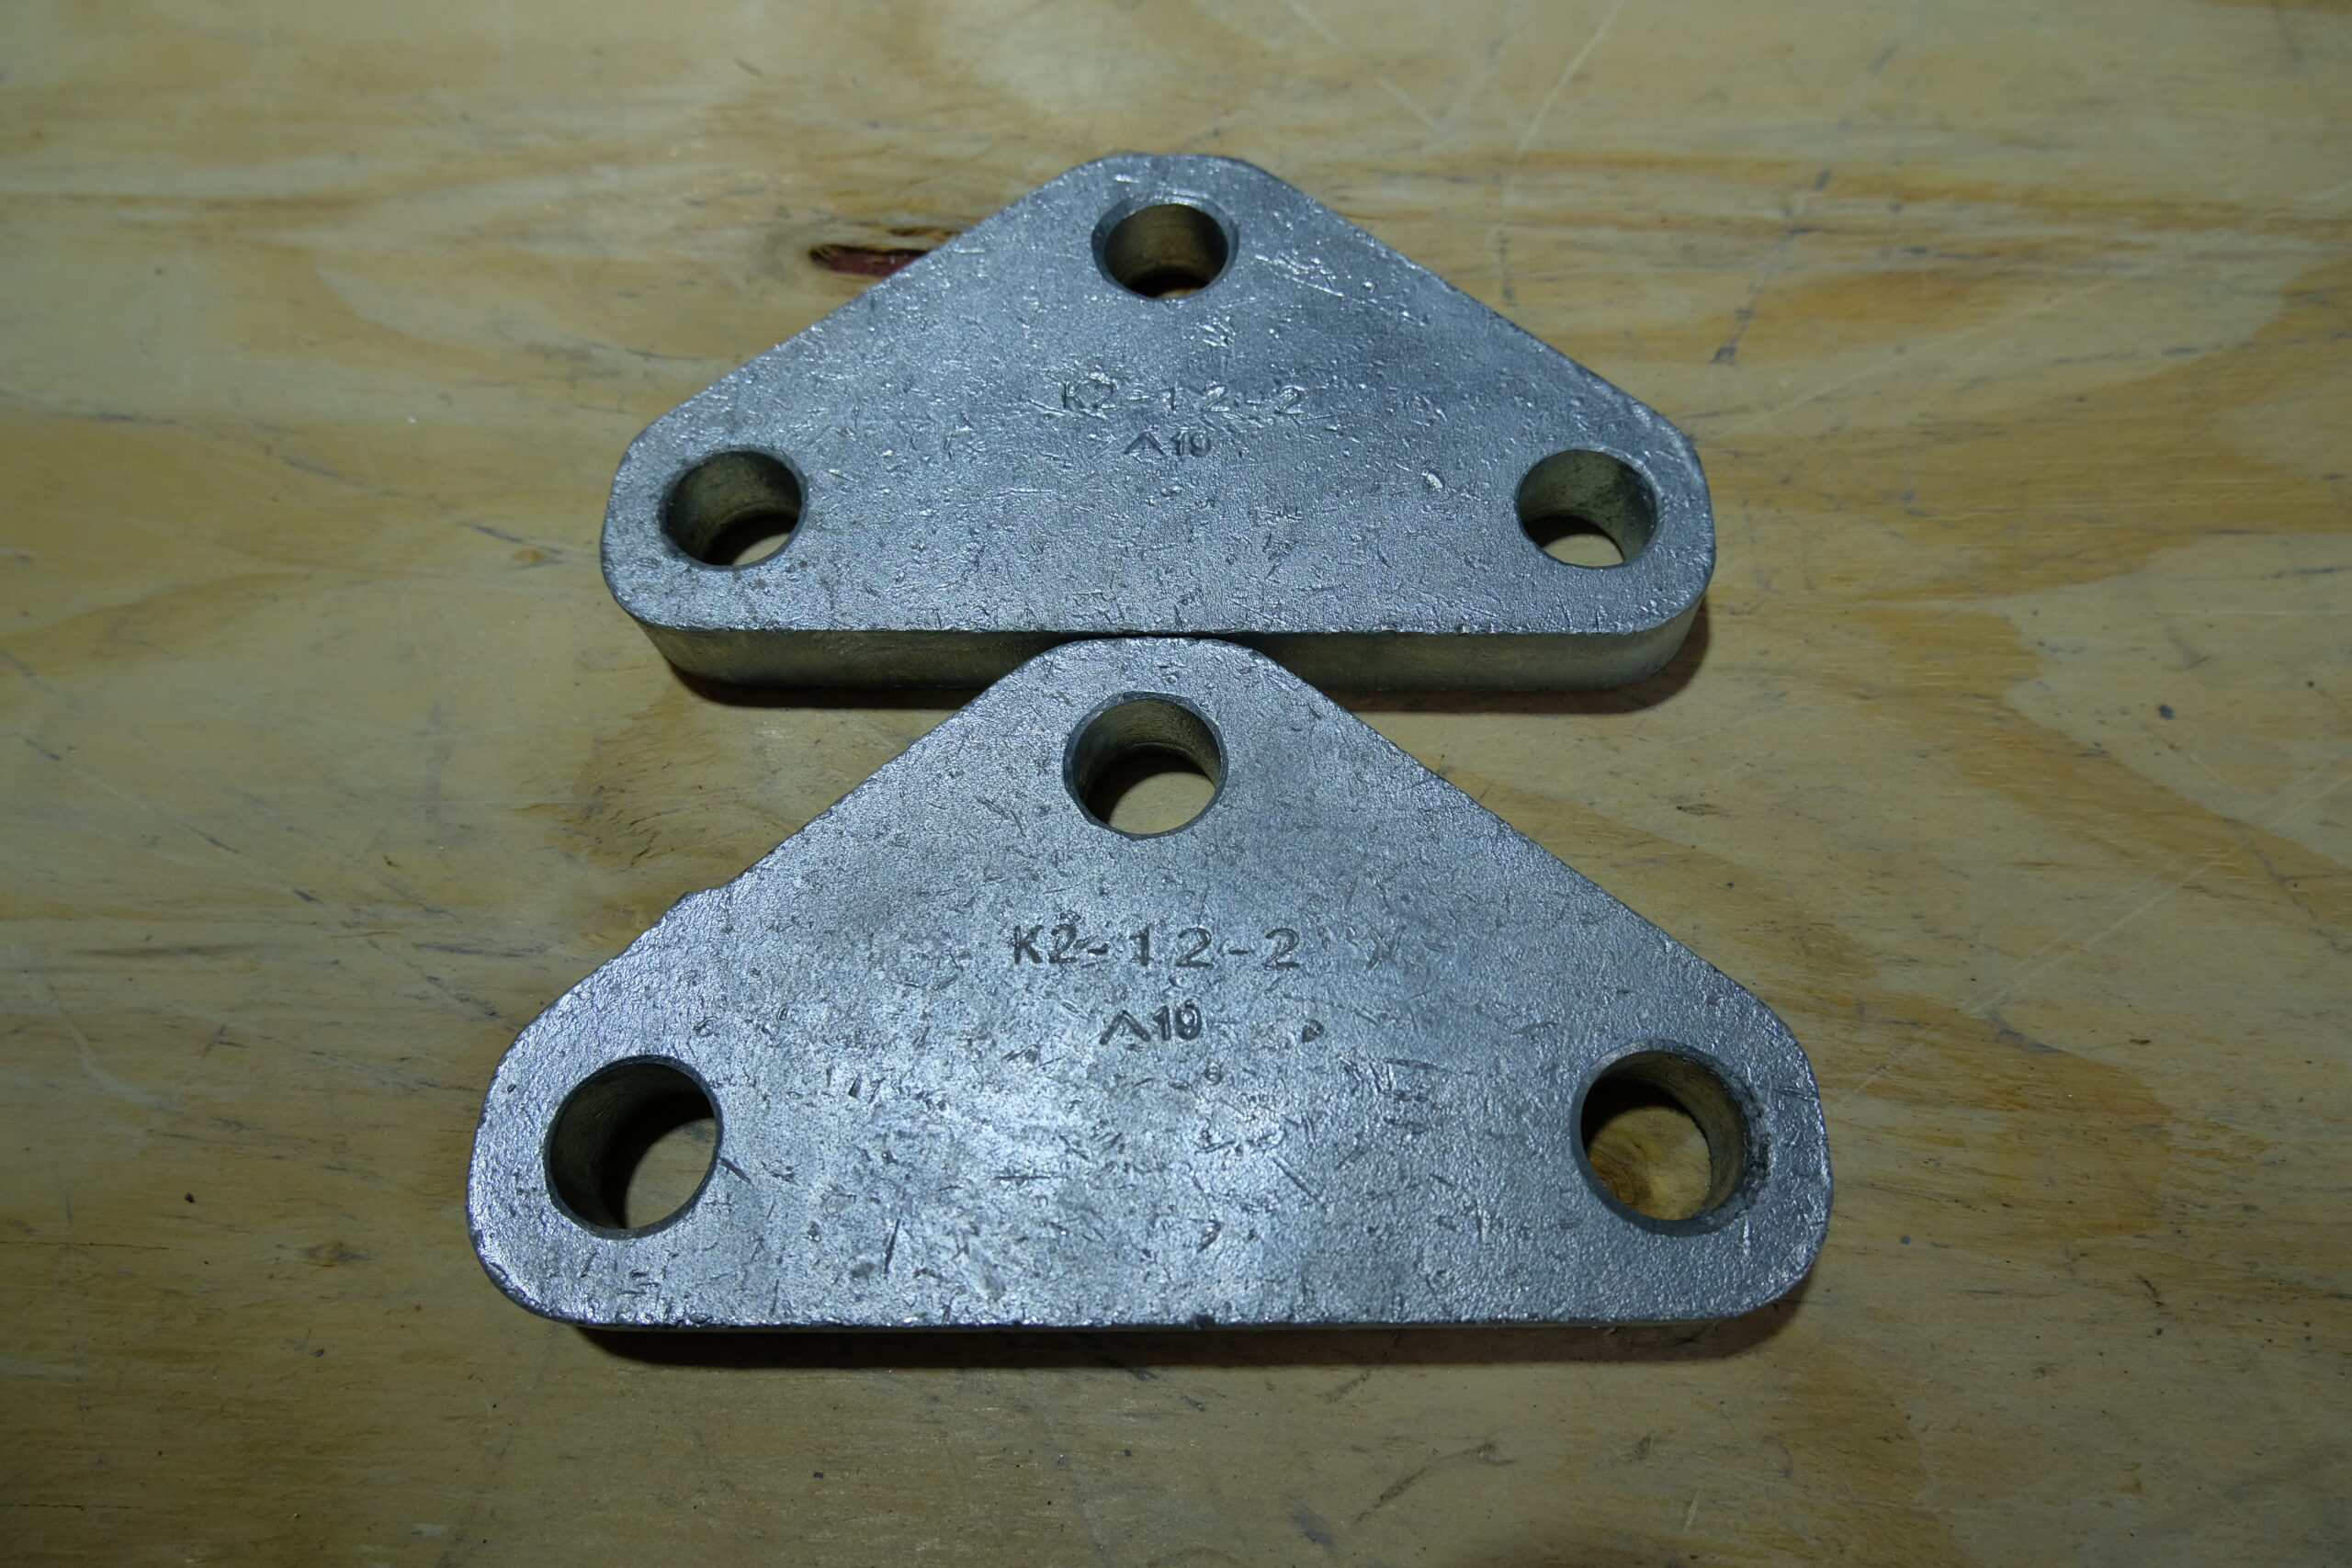 K2 12 2 scaled - Коромысла однореберные типа К2